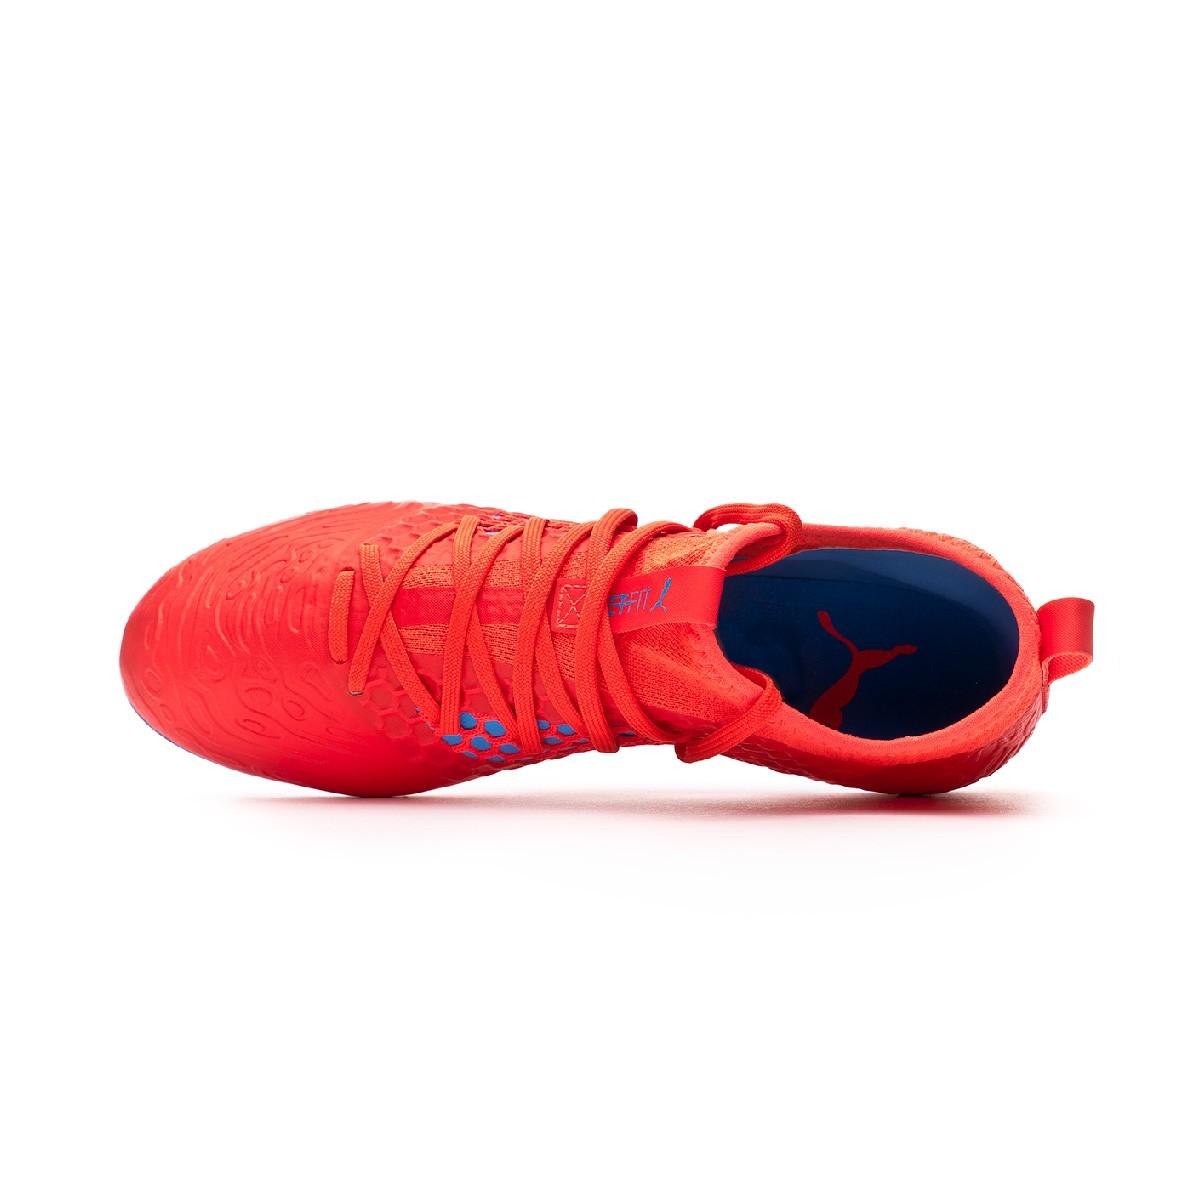 Chaussure de foot Puma Future 19.3 Netfit FGAG